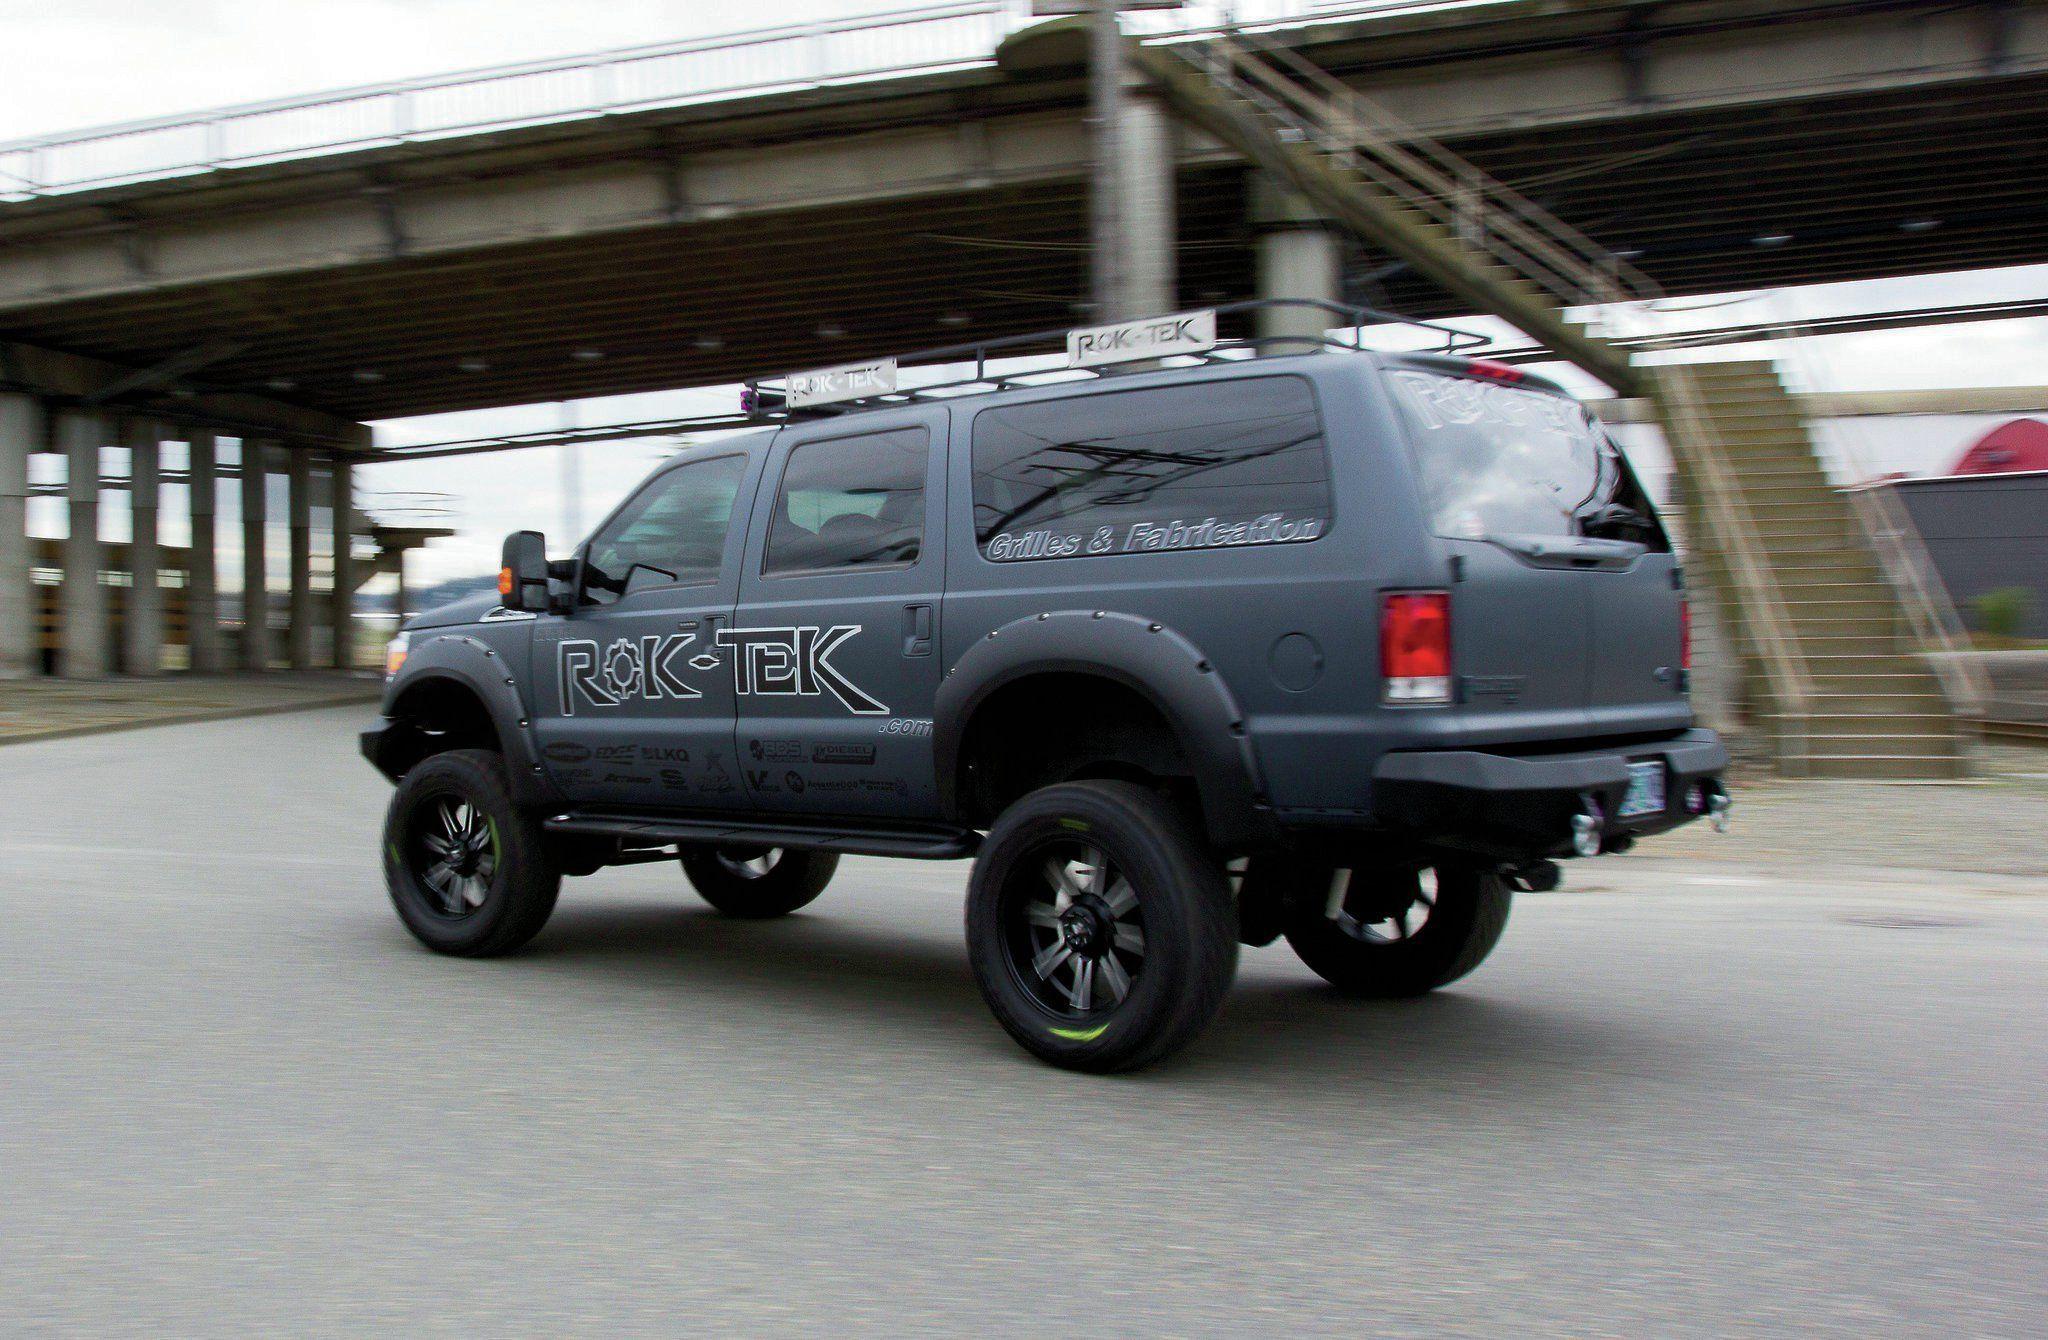 2001 Ford Excursion Broncos excursions Pinterest